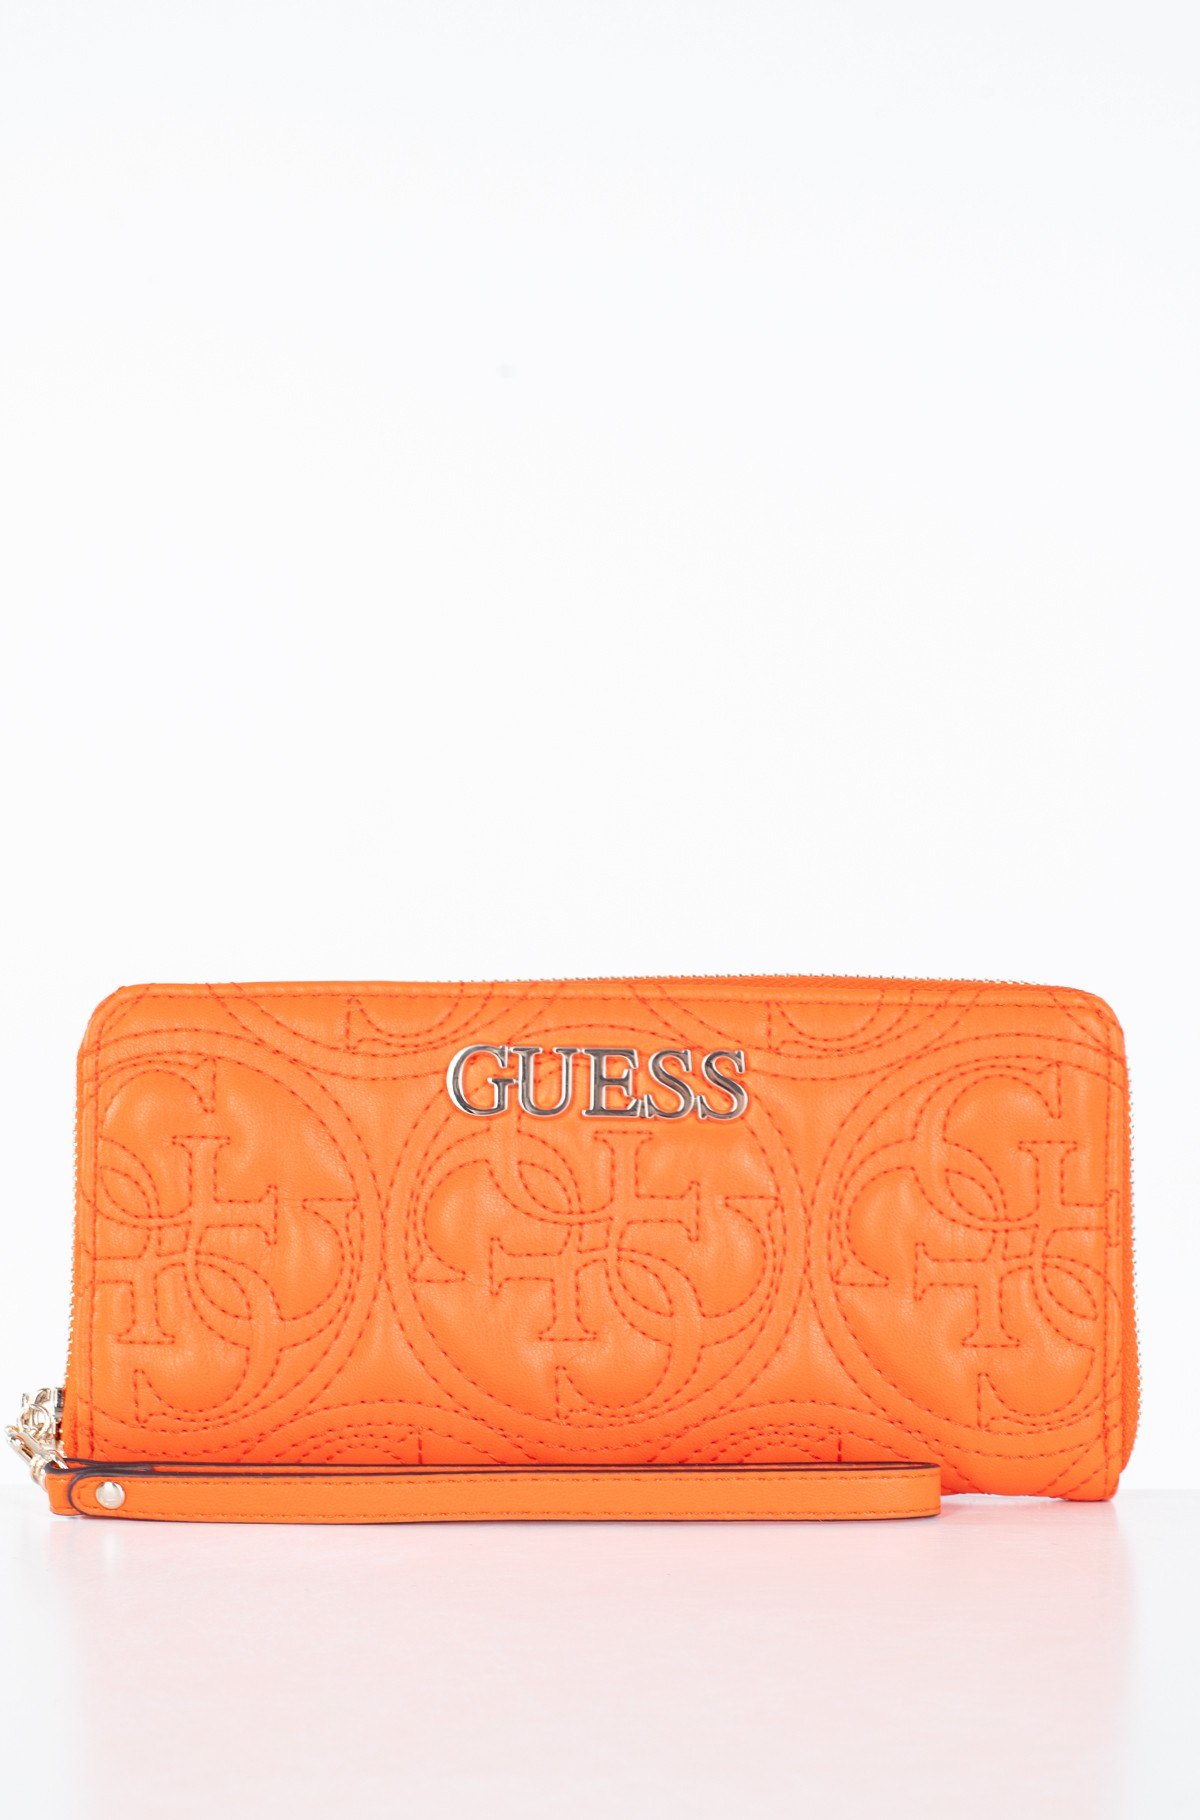 Wallet SWQG69 94460-full-1